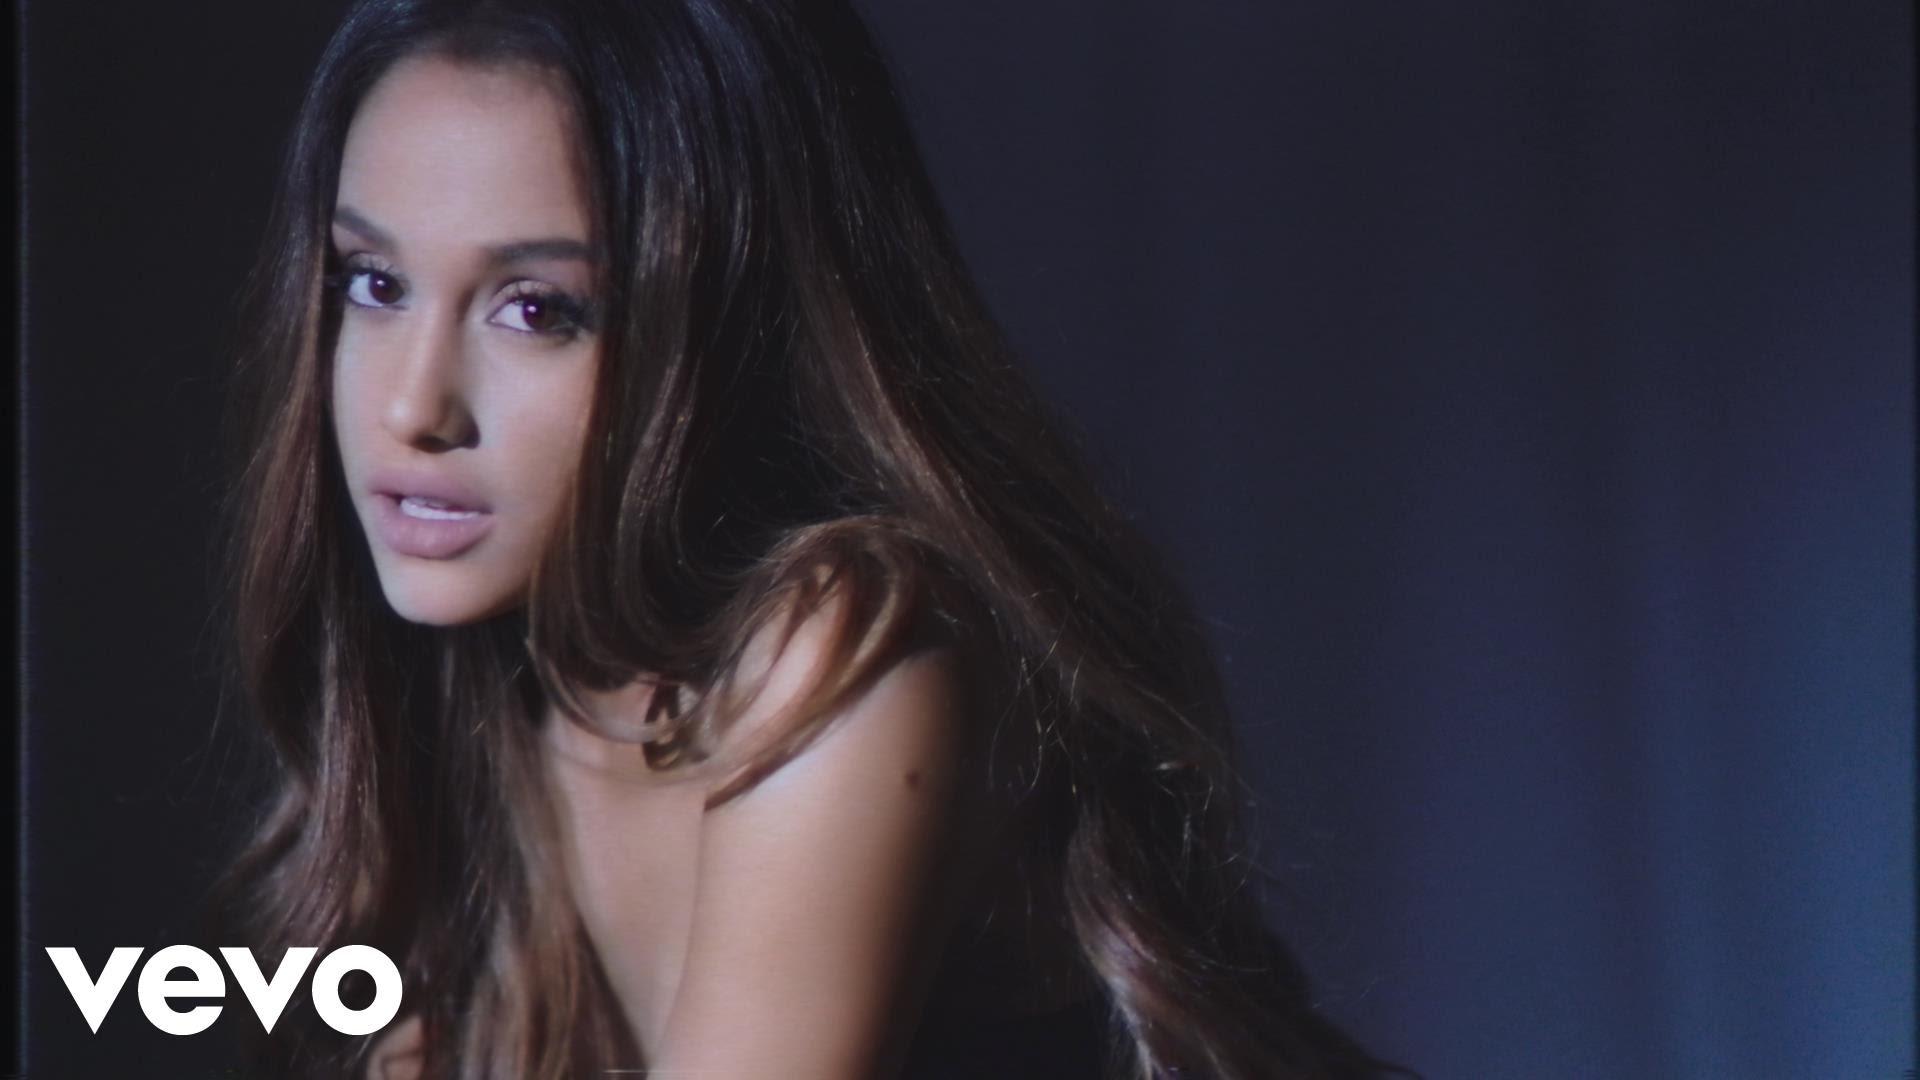 Ariana Grande – Dangerous Woman – Music Video